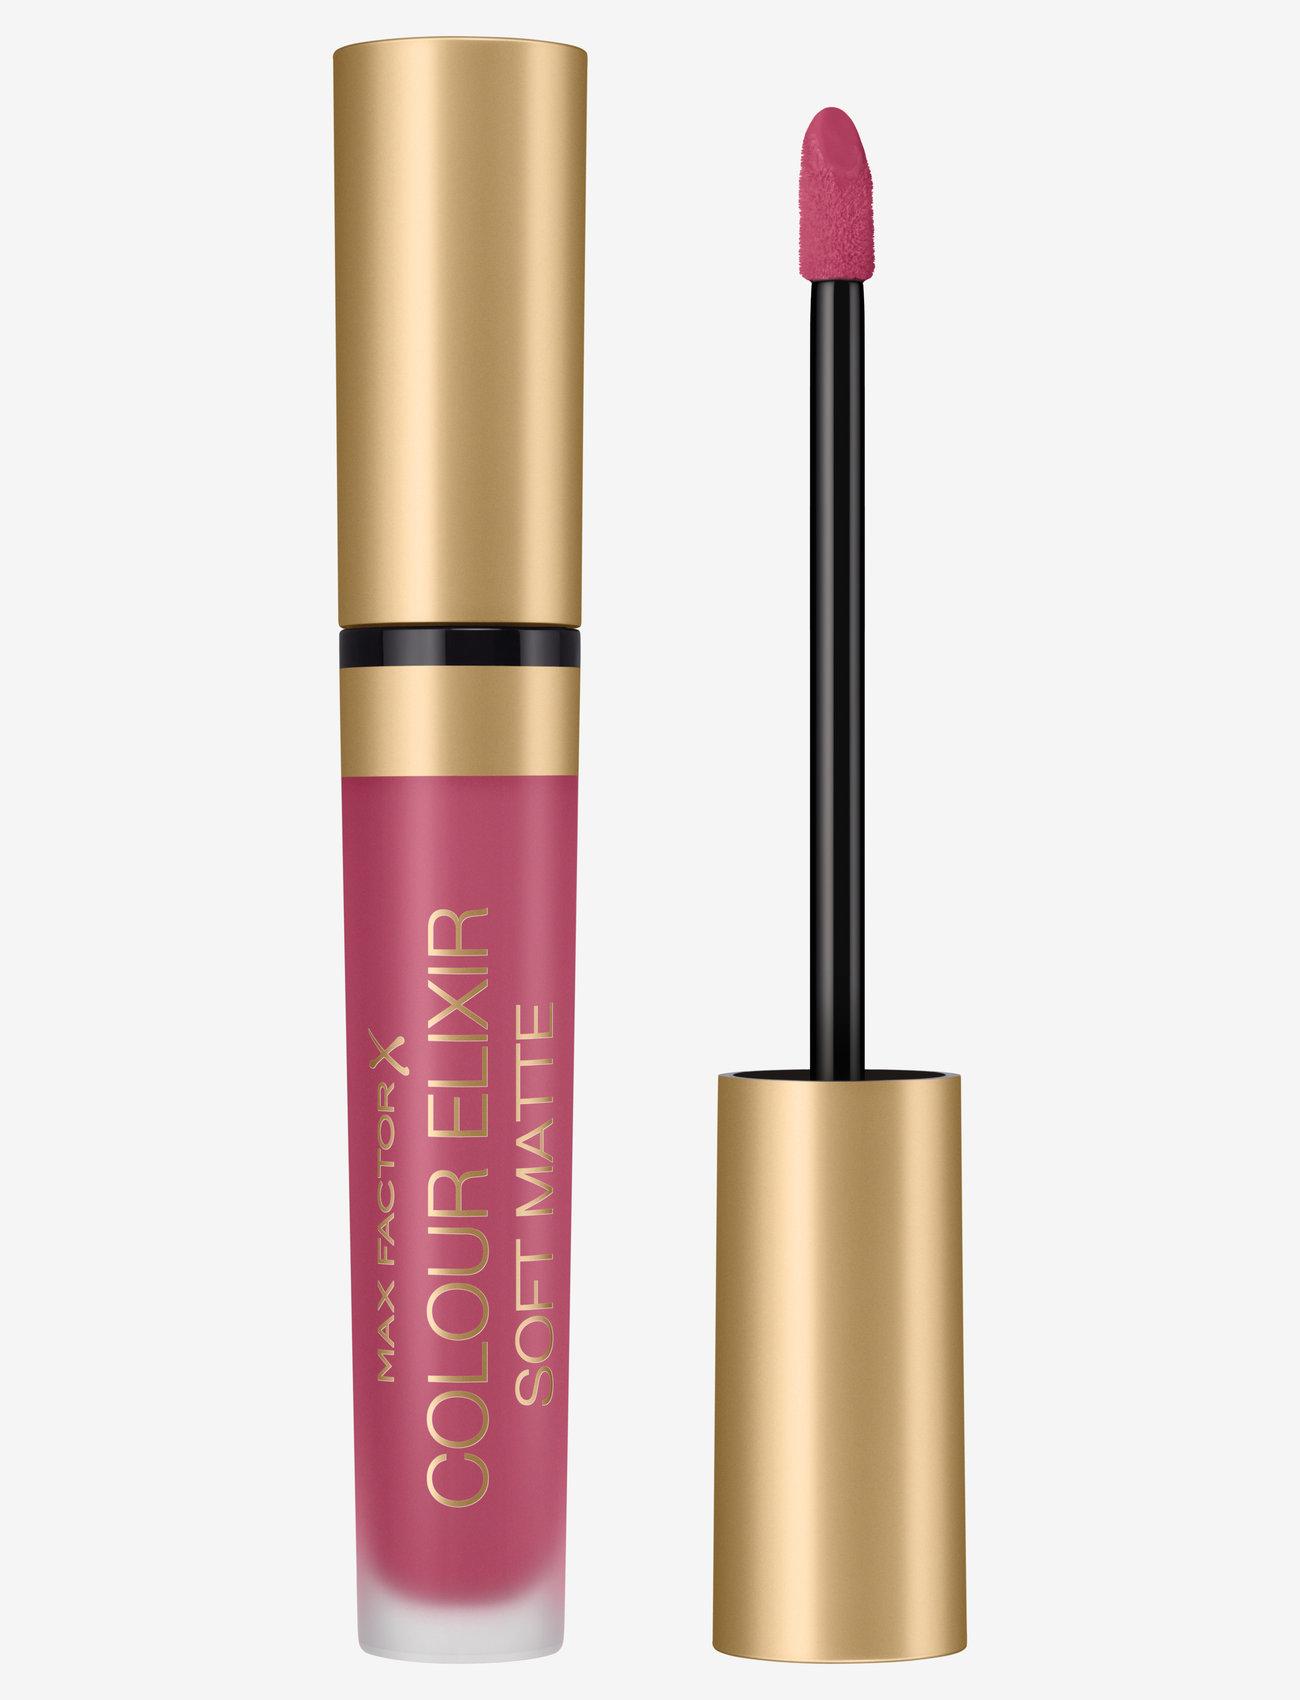 Max Factor - Color Elixir Soft Matte Lipstick 20 Blushing Peony - läppstift - 20 blushing peony - 0